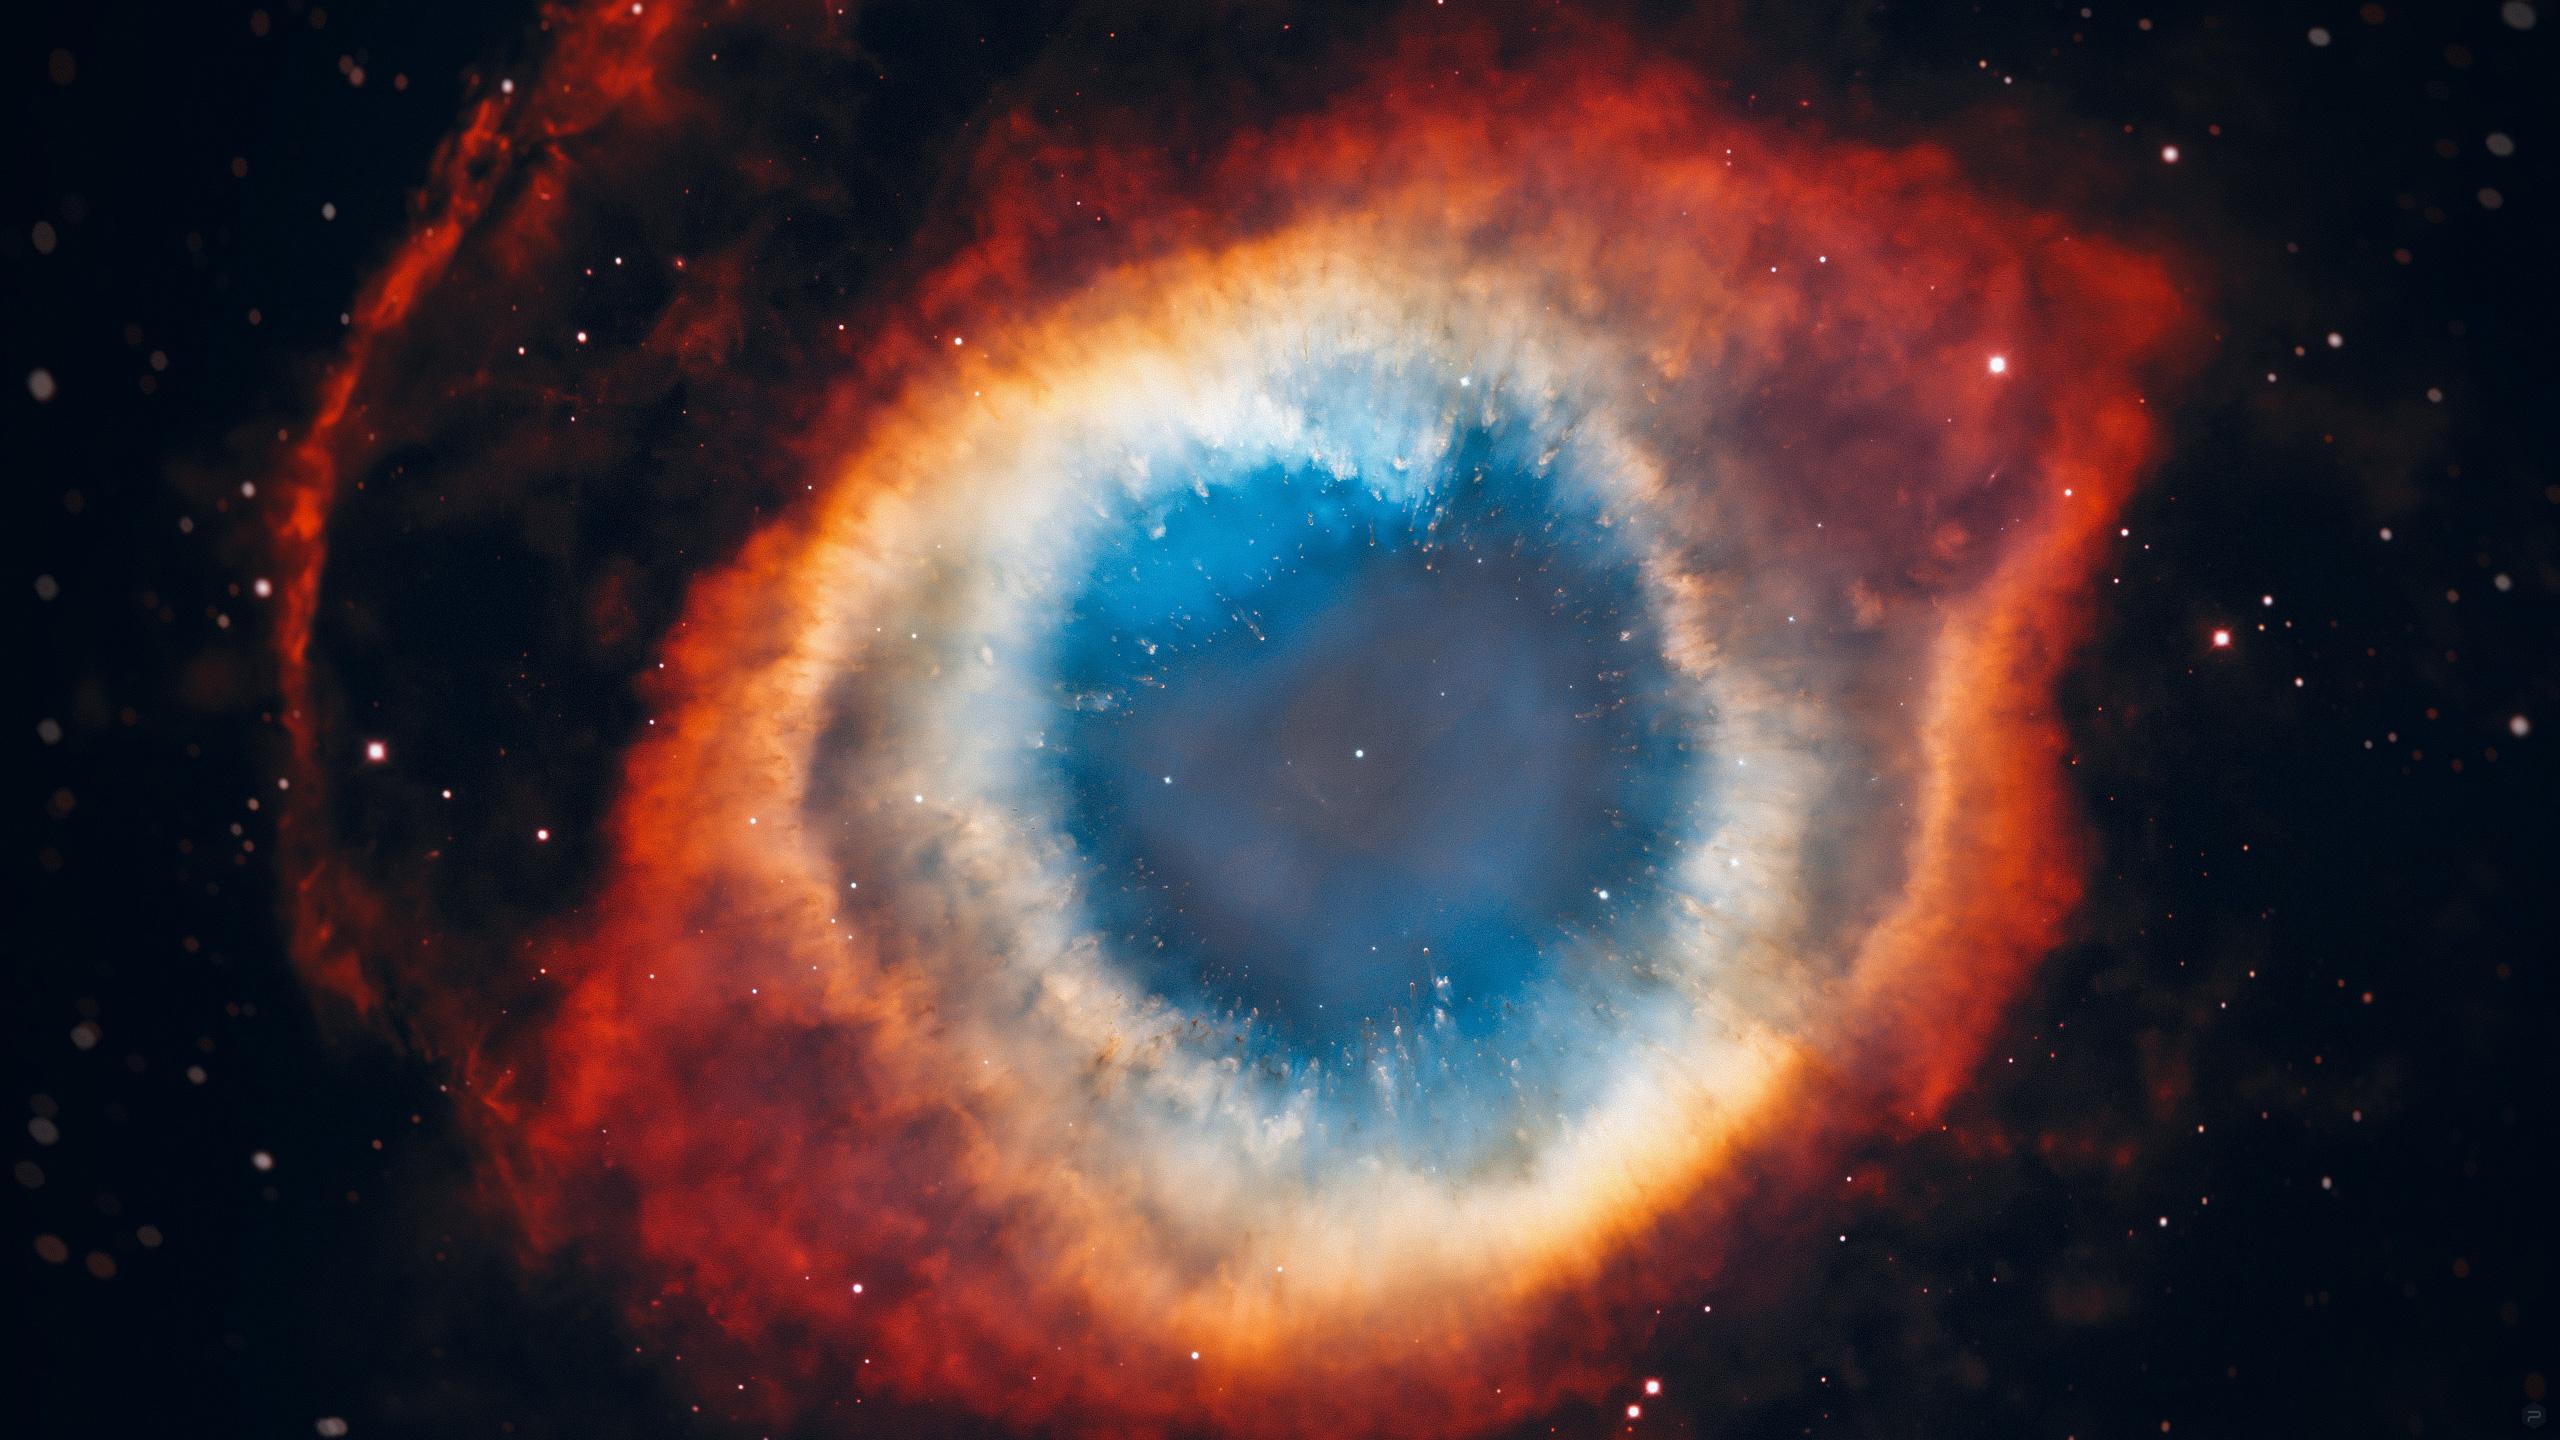 Space Hubble Science Universe NASA Helix Nebula 2560x1440